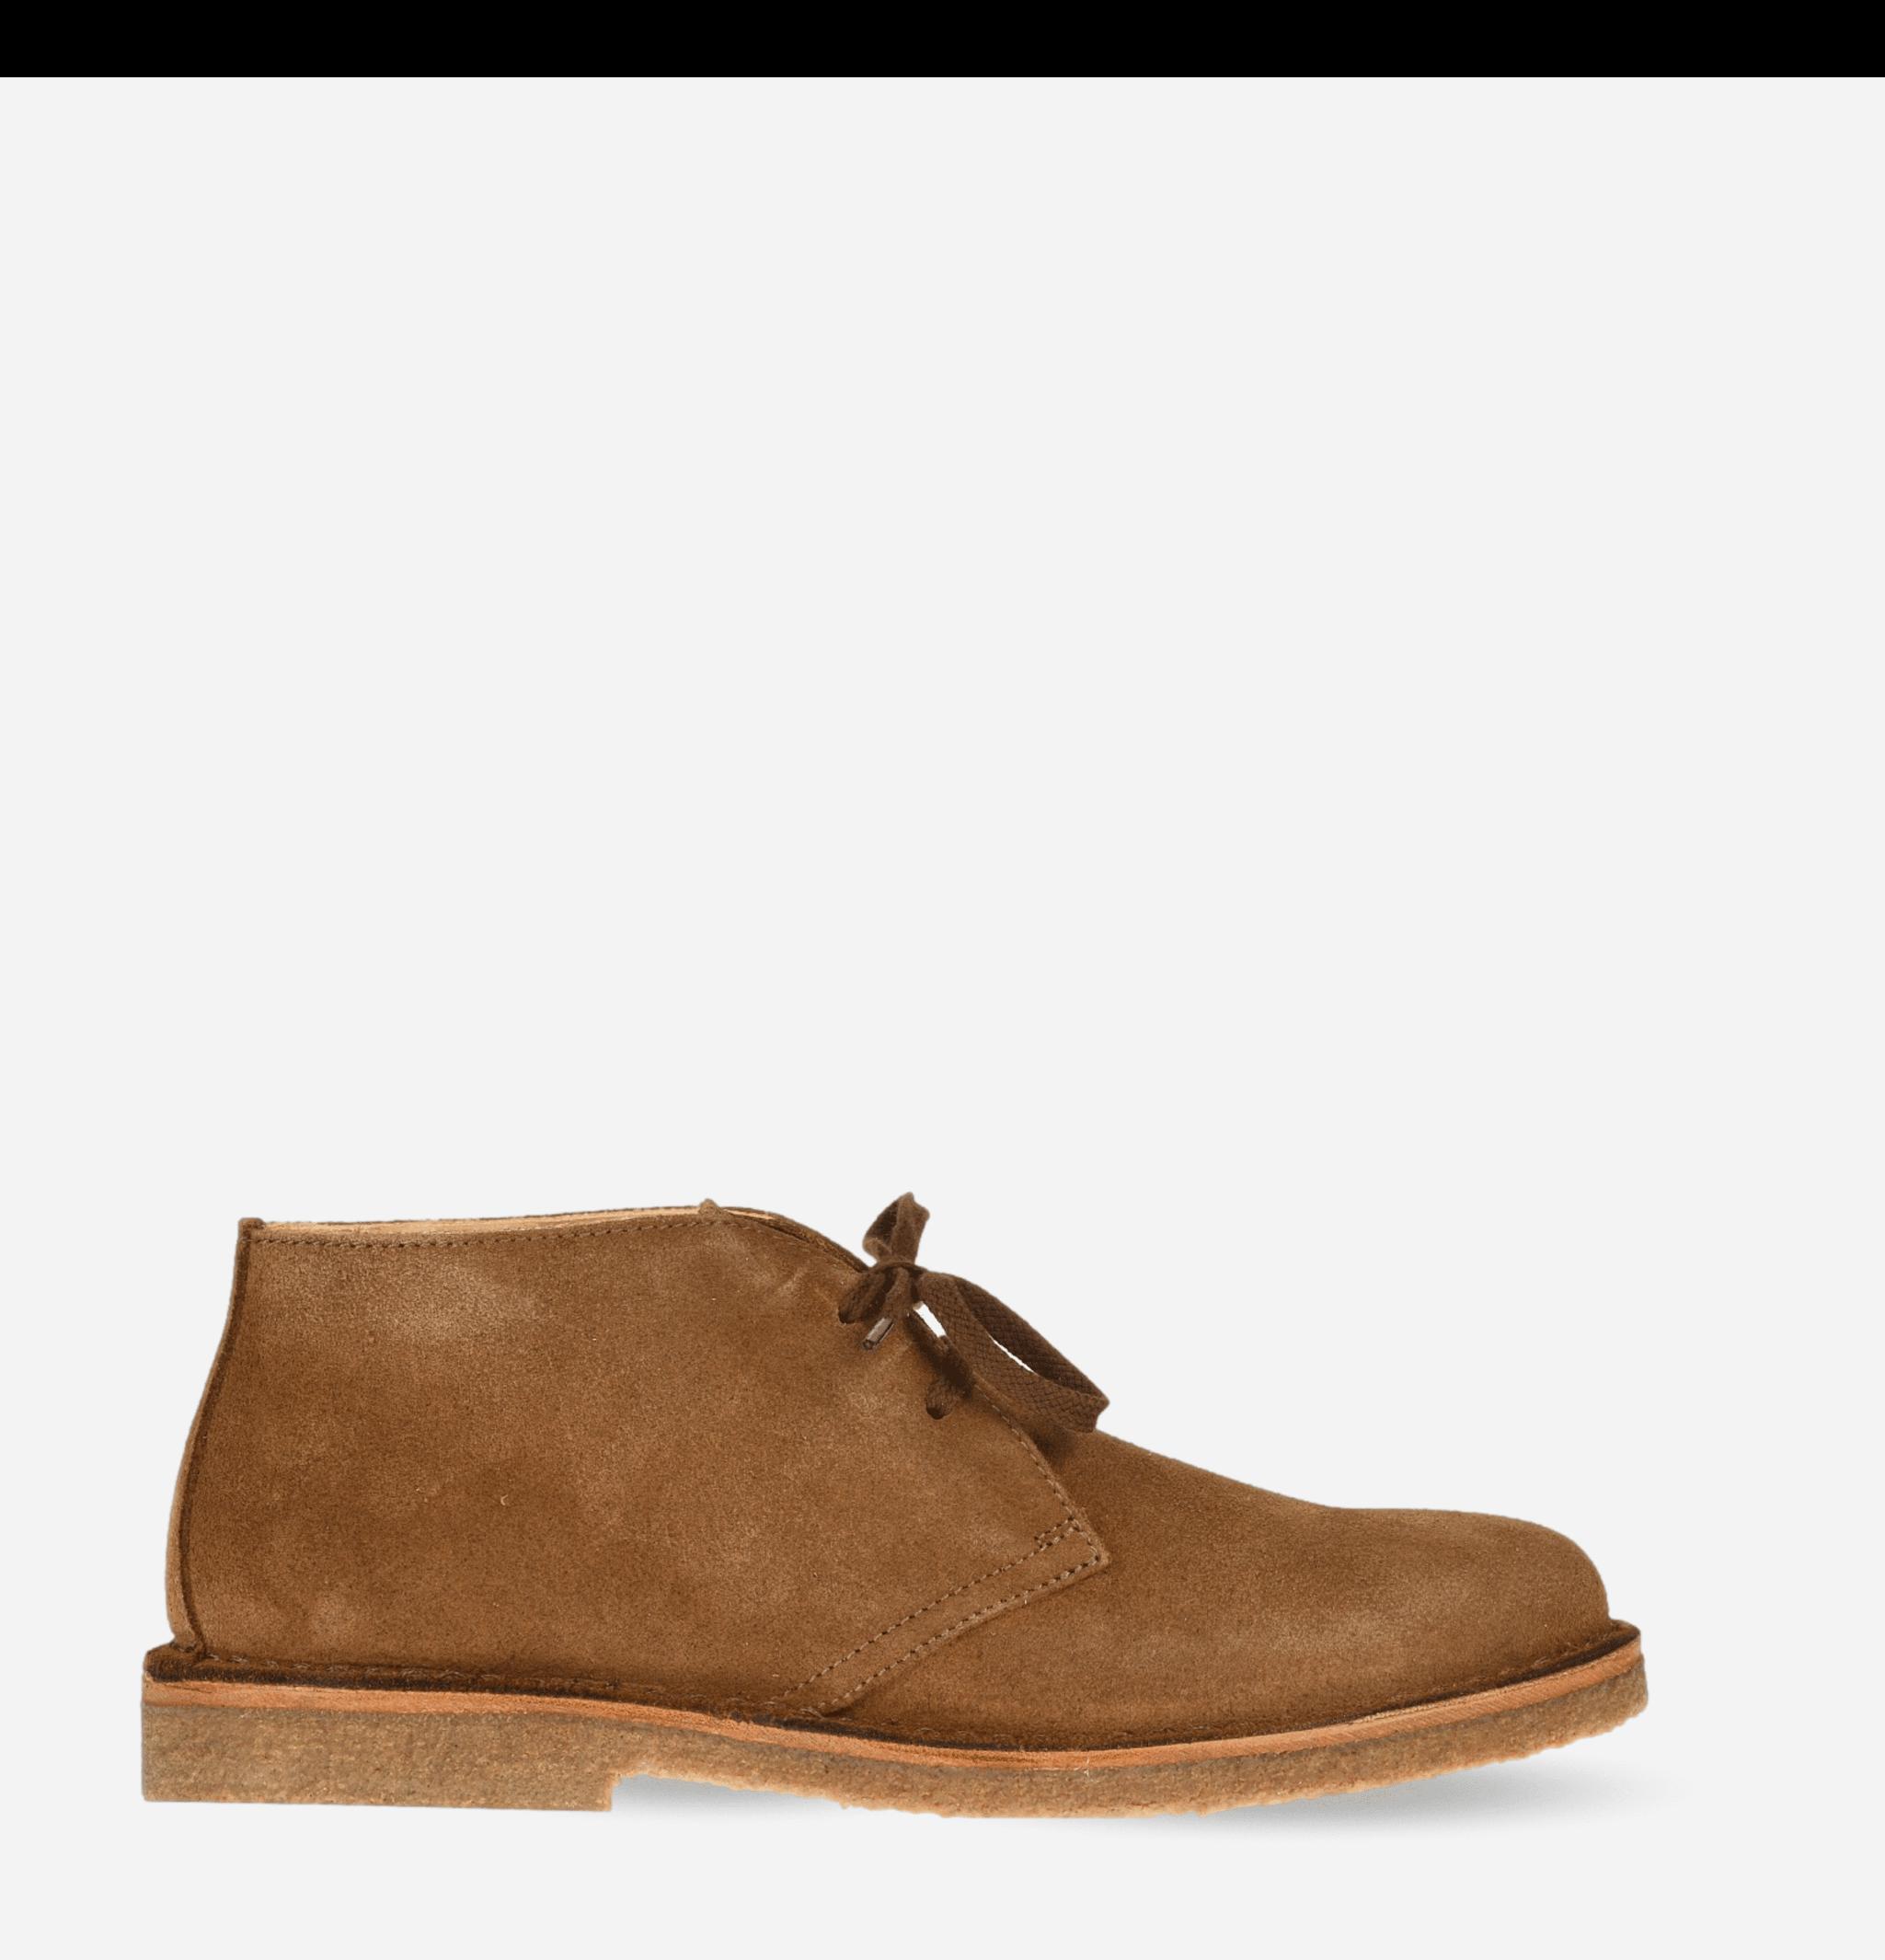 Greenflex Boots Khaki